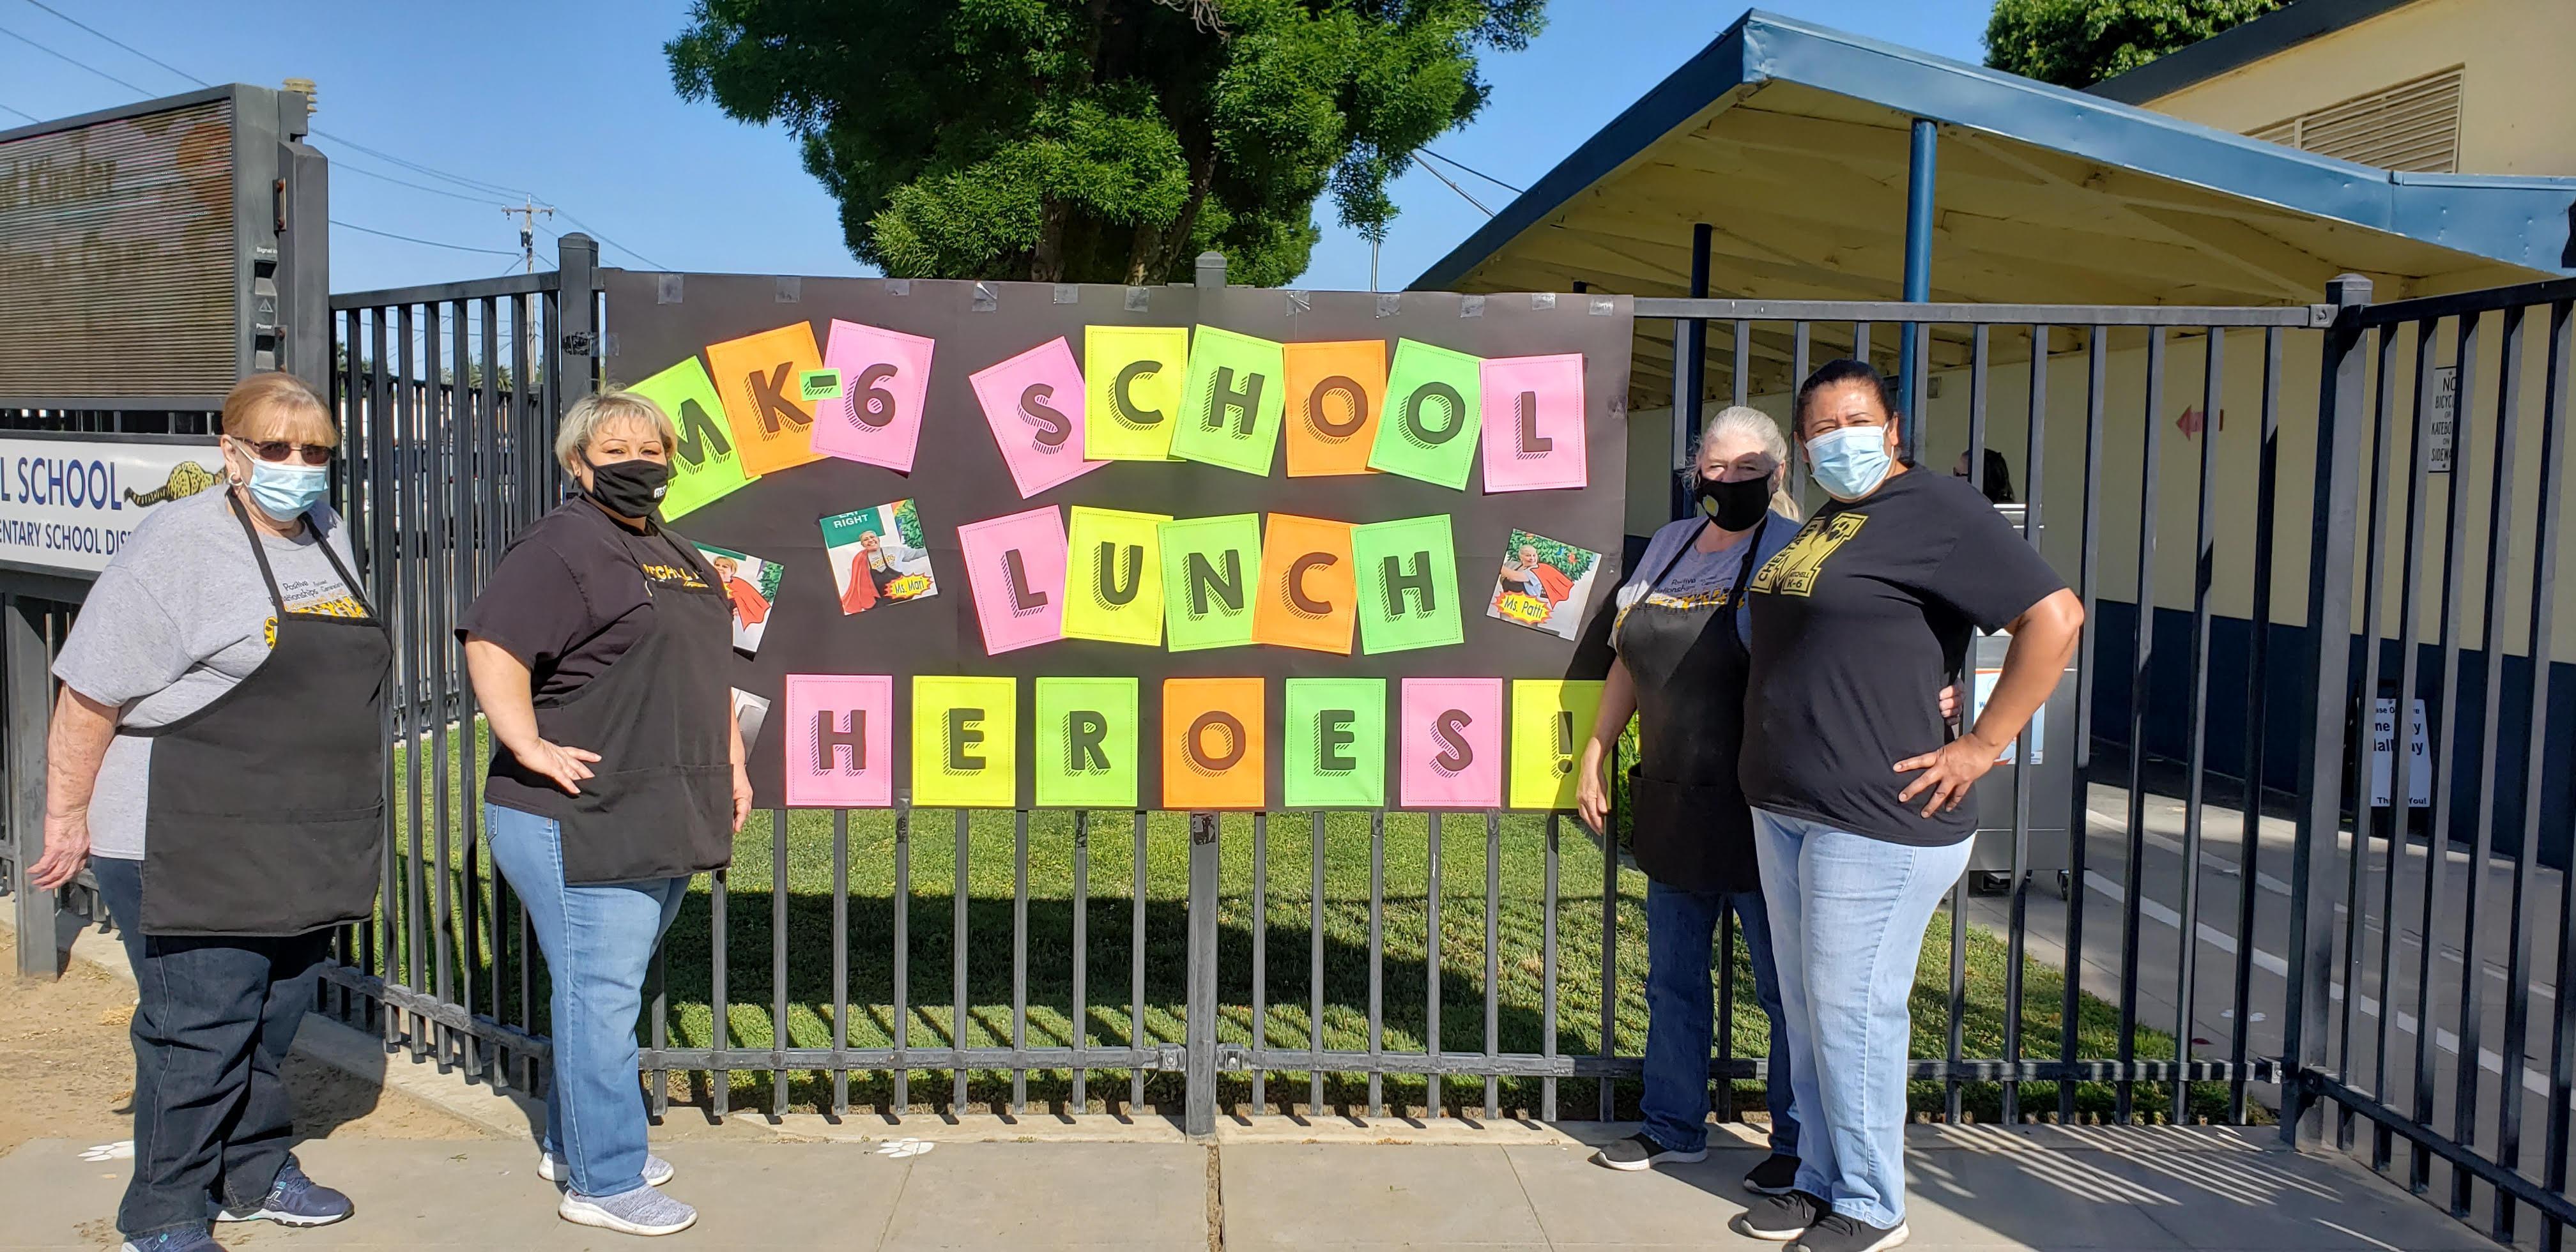 MK6 Lunch Heros